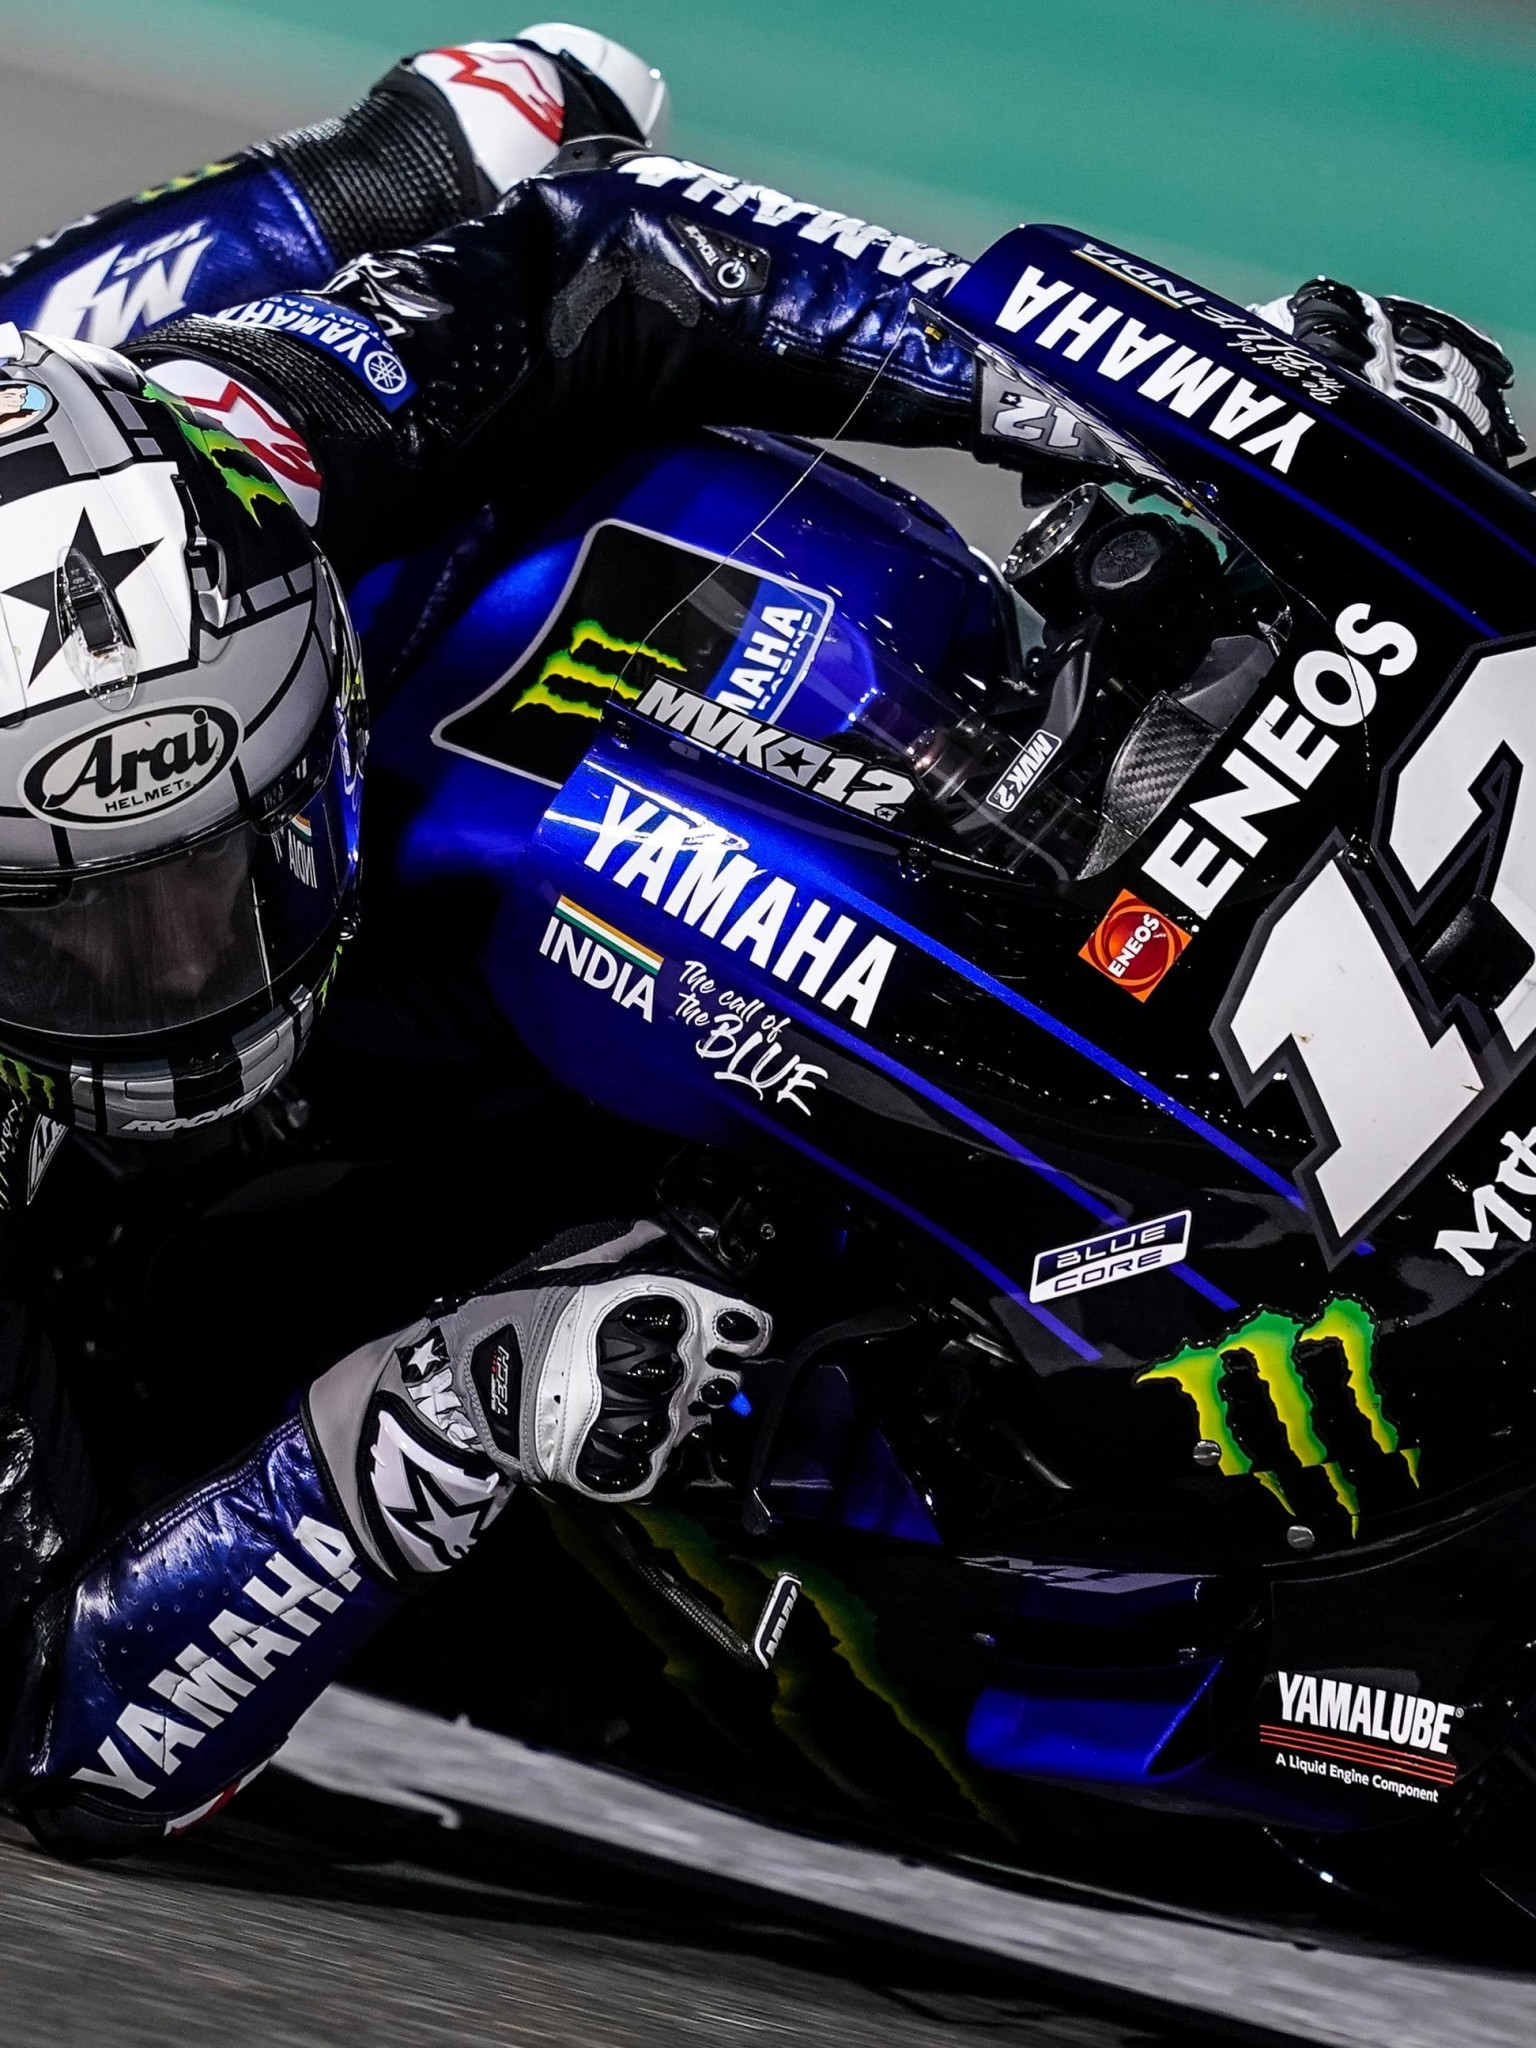 Download 1536x2048 Yamaha Racing Bike Motogp 2019 Wallpapers for 1536x2048